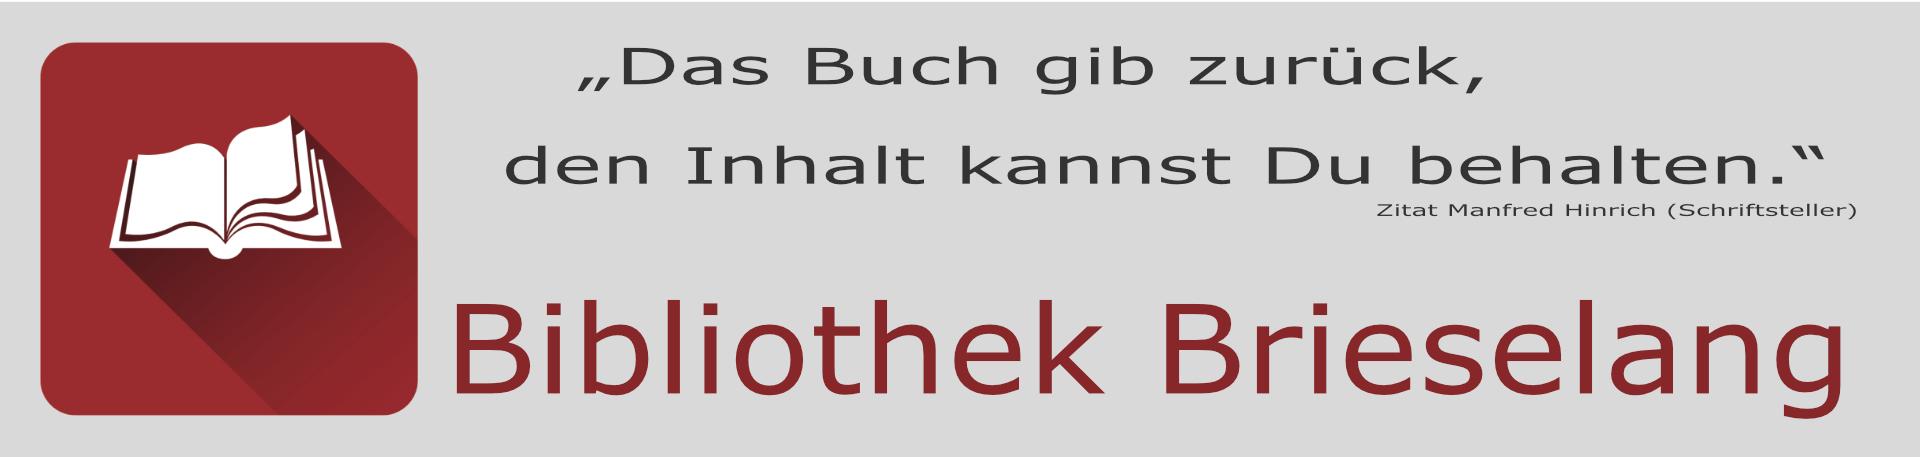 Förderverein Bibliothek Brieselang e.V.